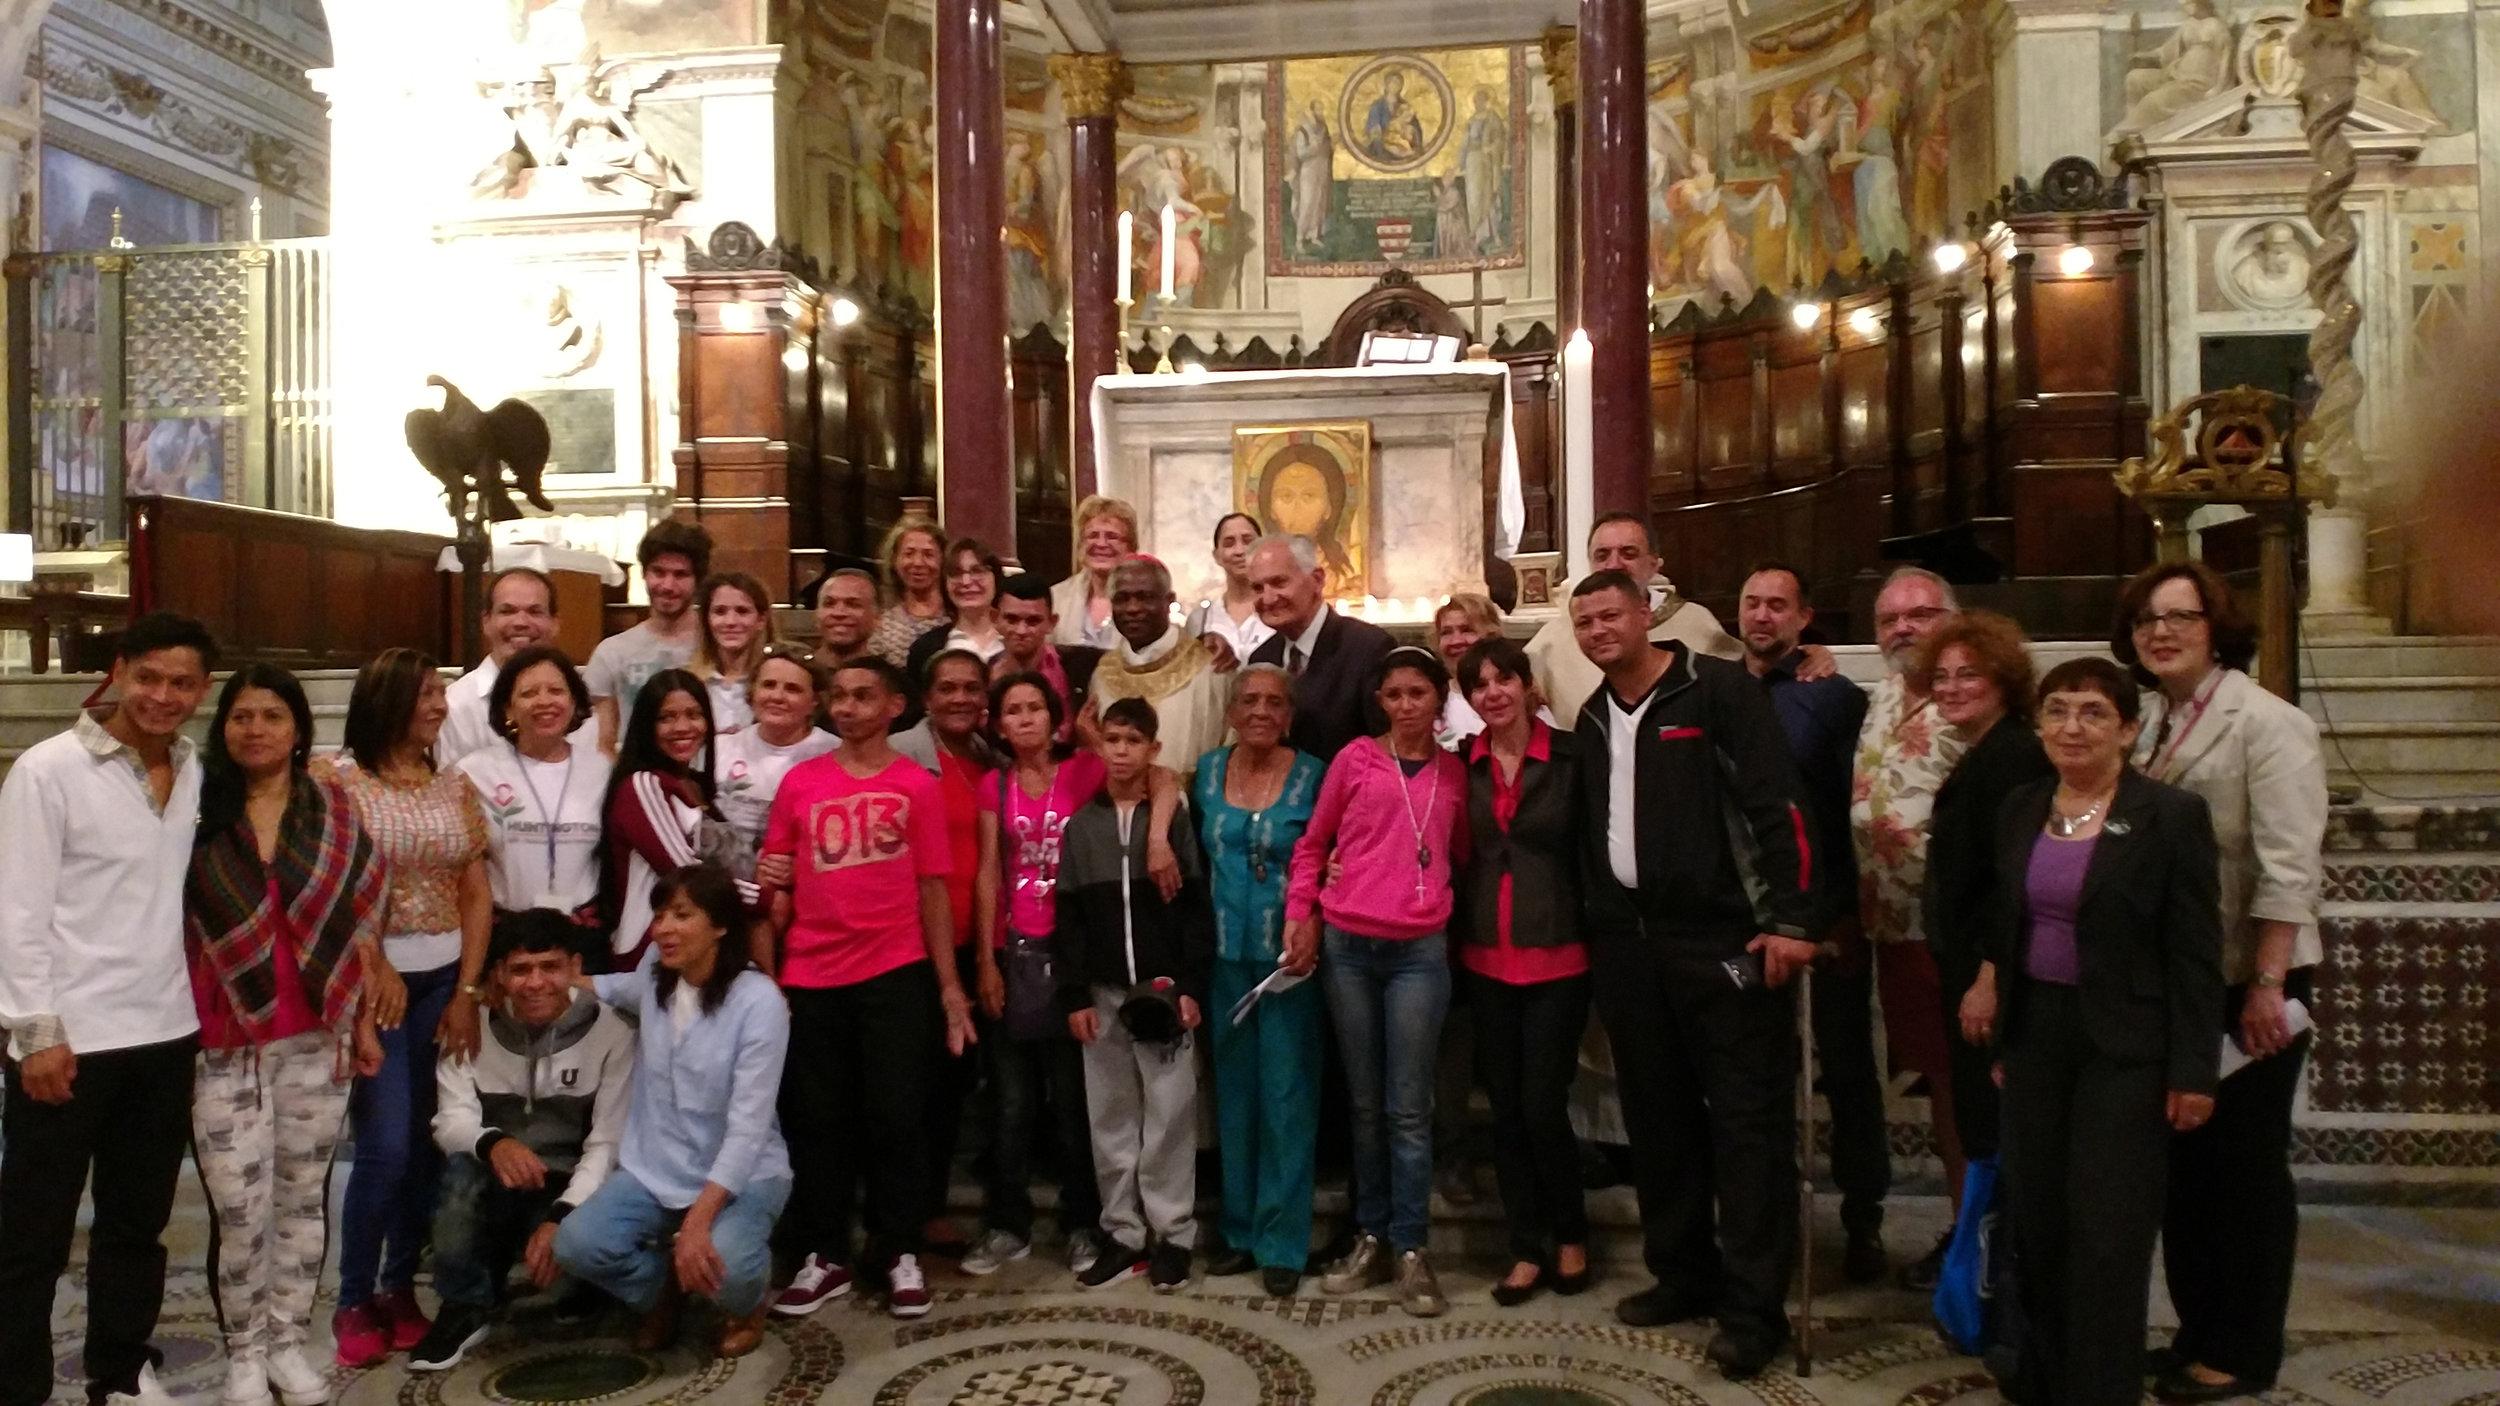 Mass at Basilica di Santa Maria in Trastevere